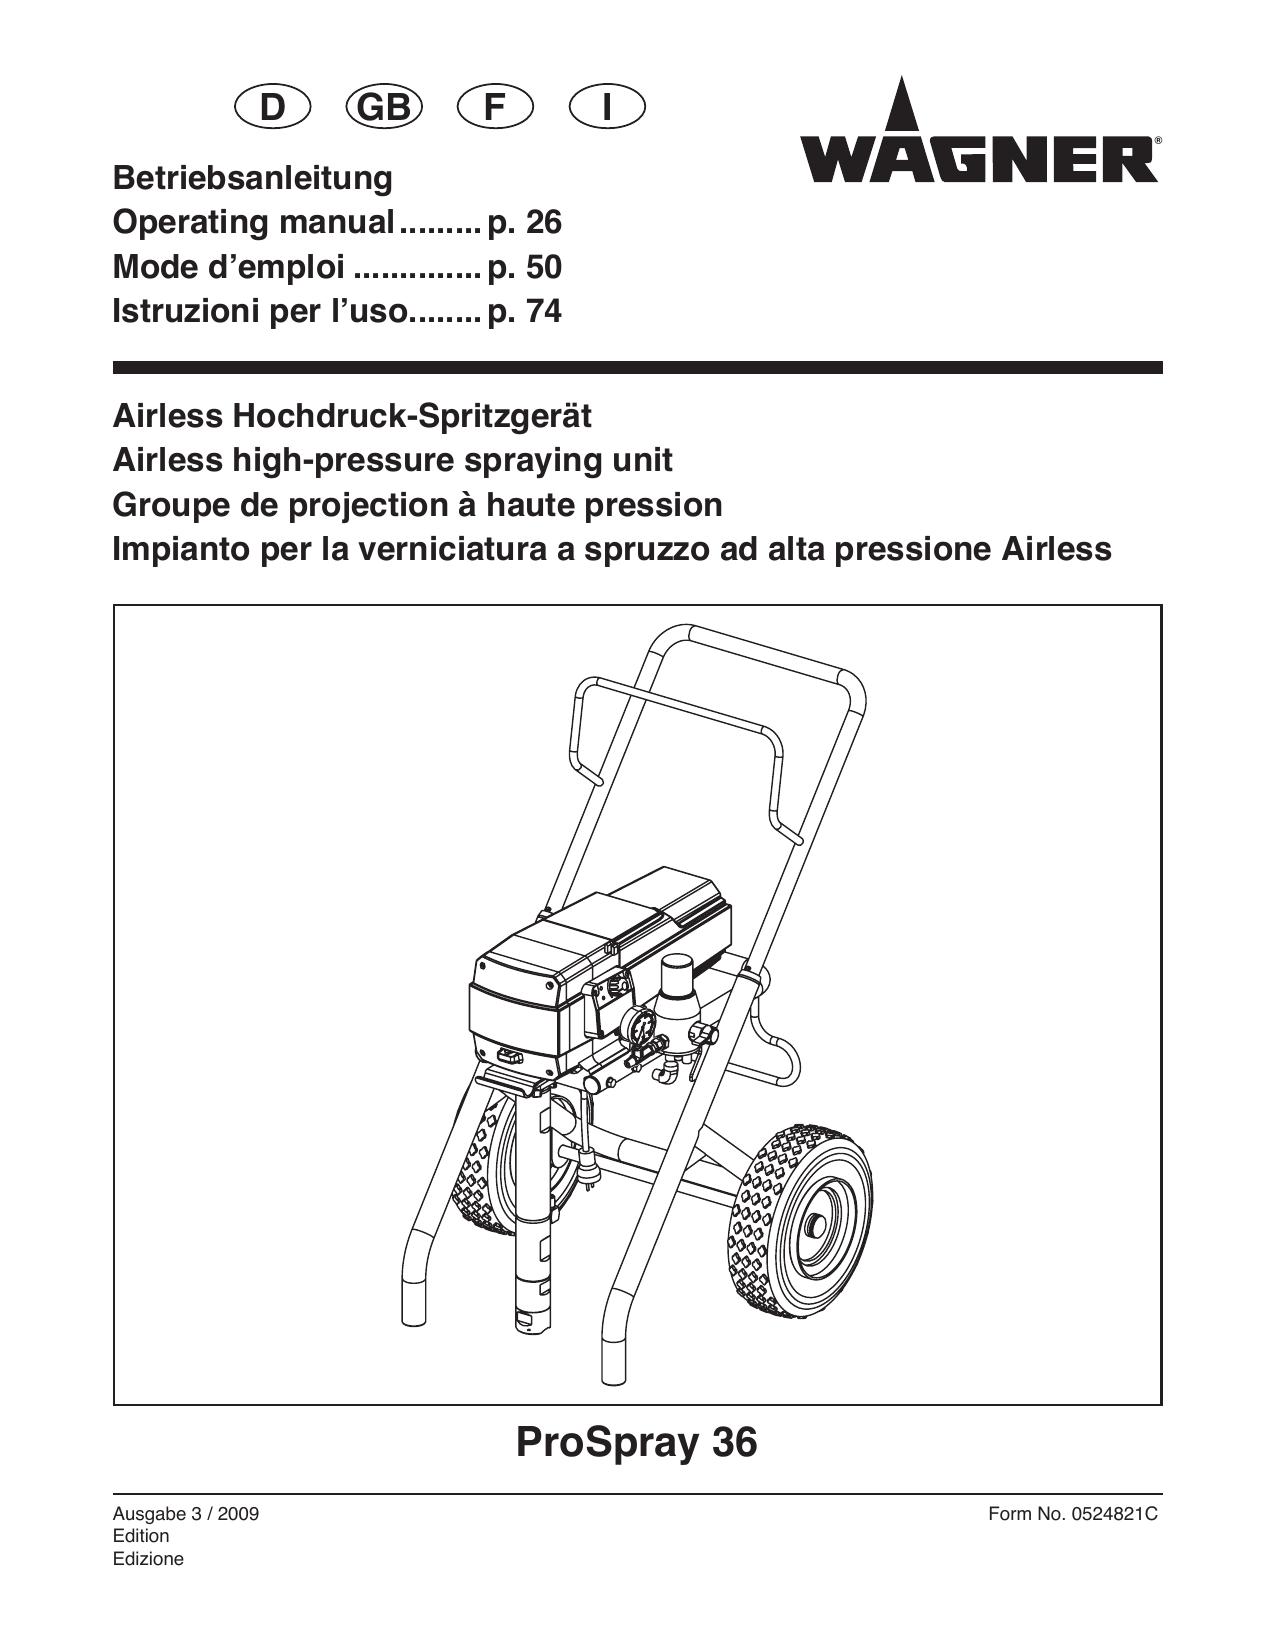 Wagner Ps36 Airless Sprayers Spray Equipment Motor Wiring Diagram